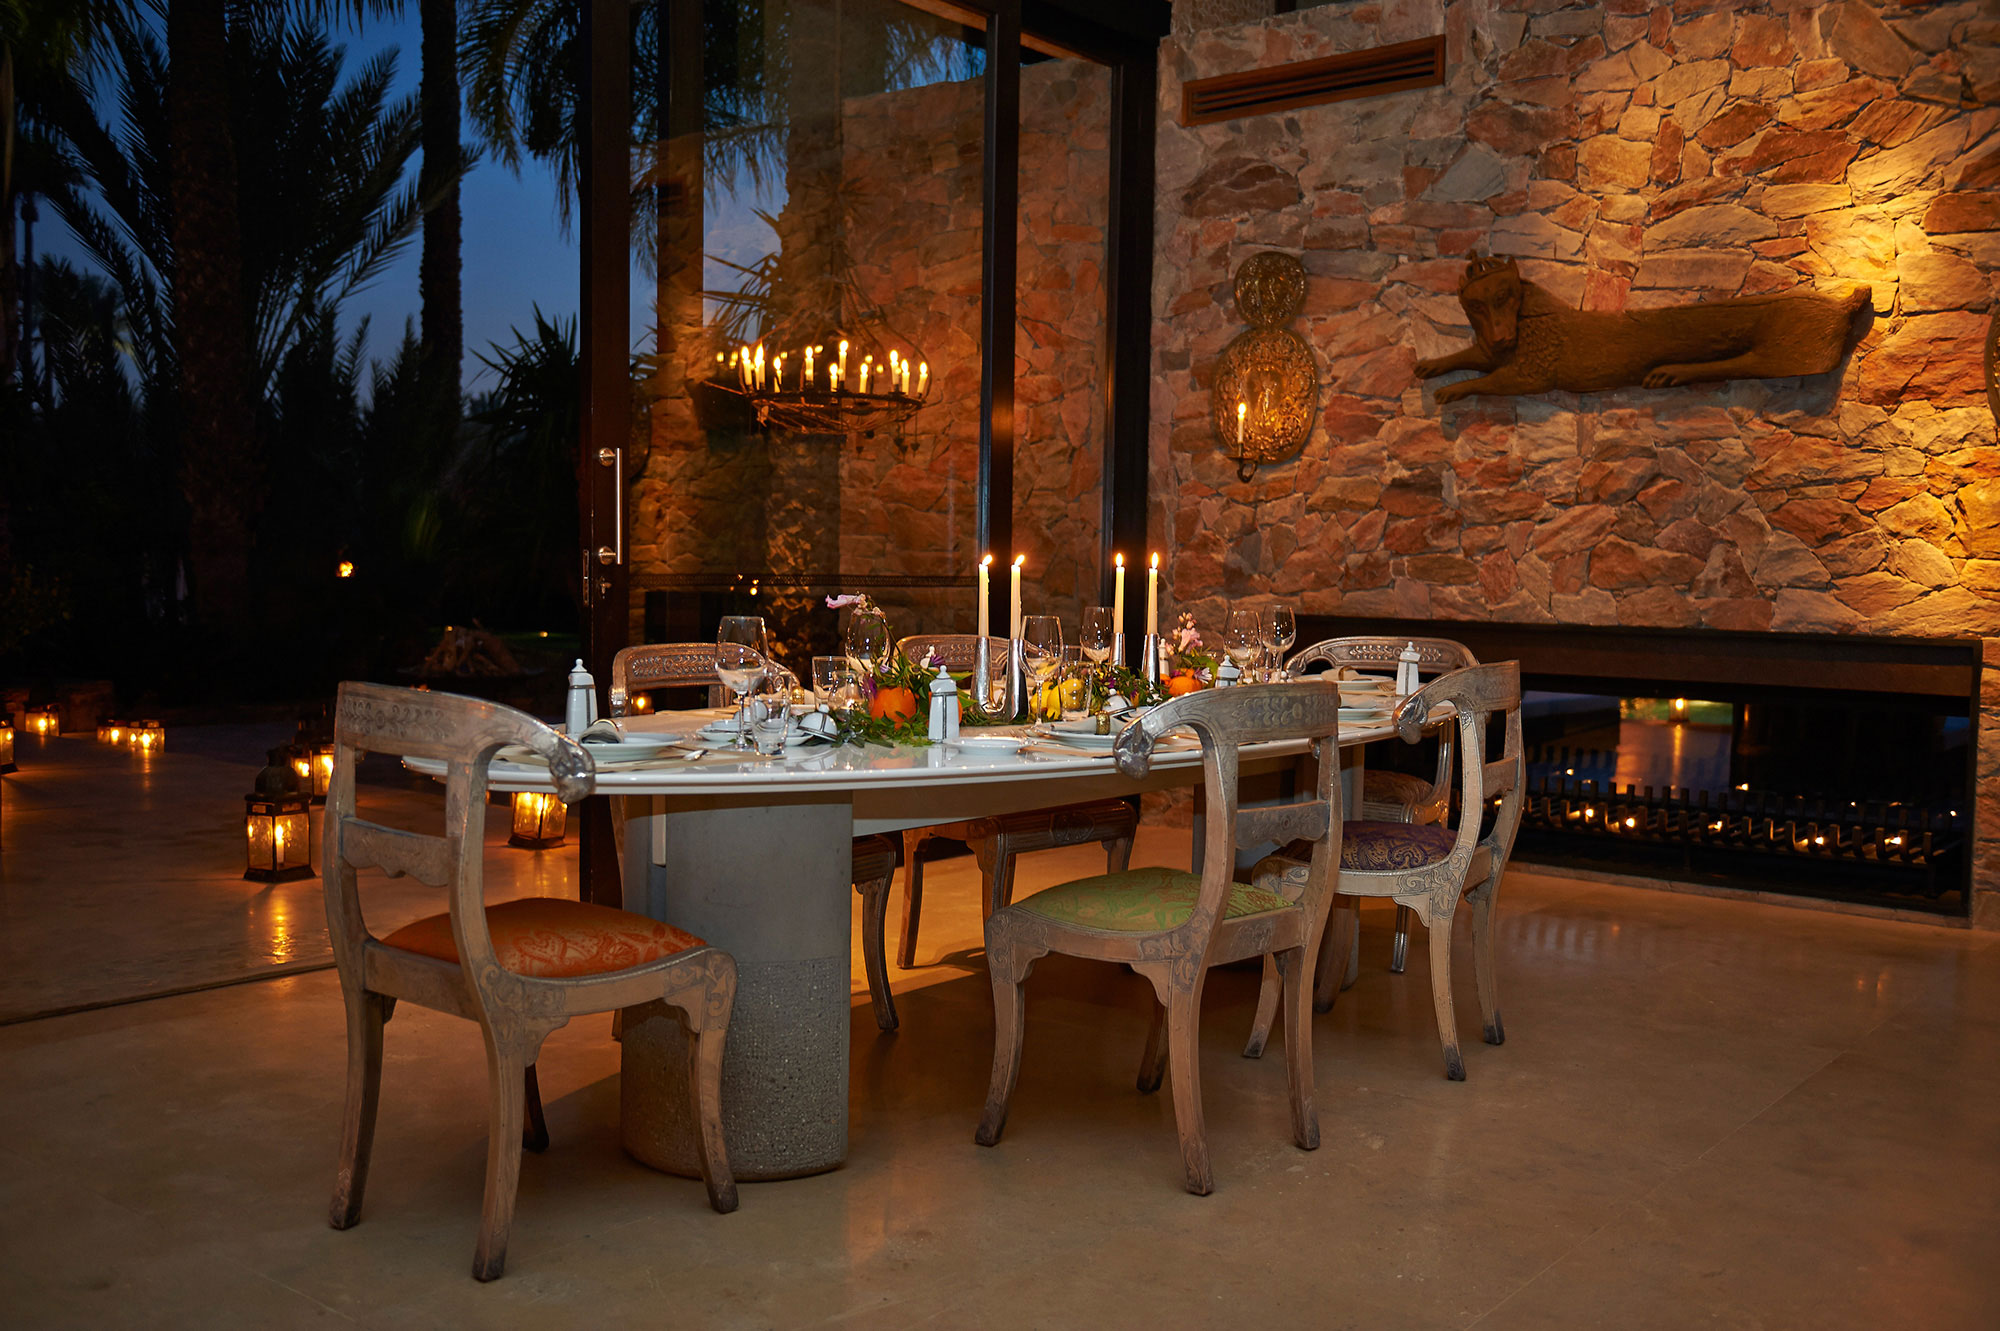 Dar JL Hotel Marrakech Morocco 36